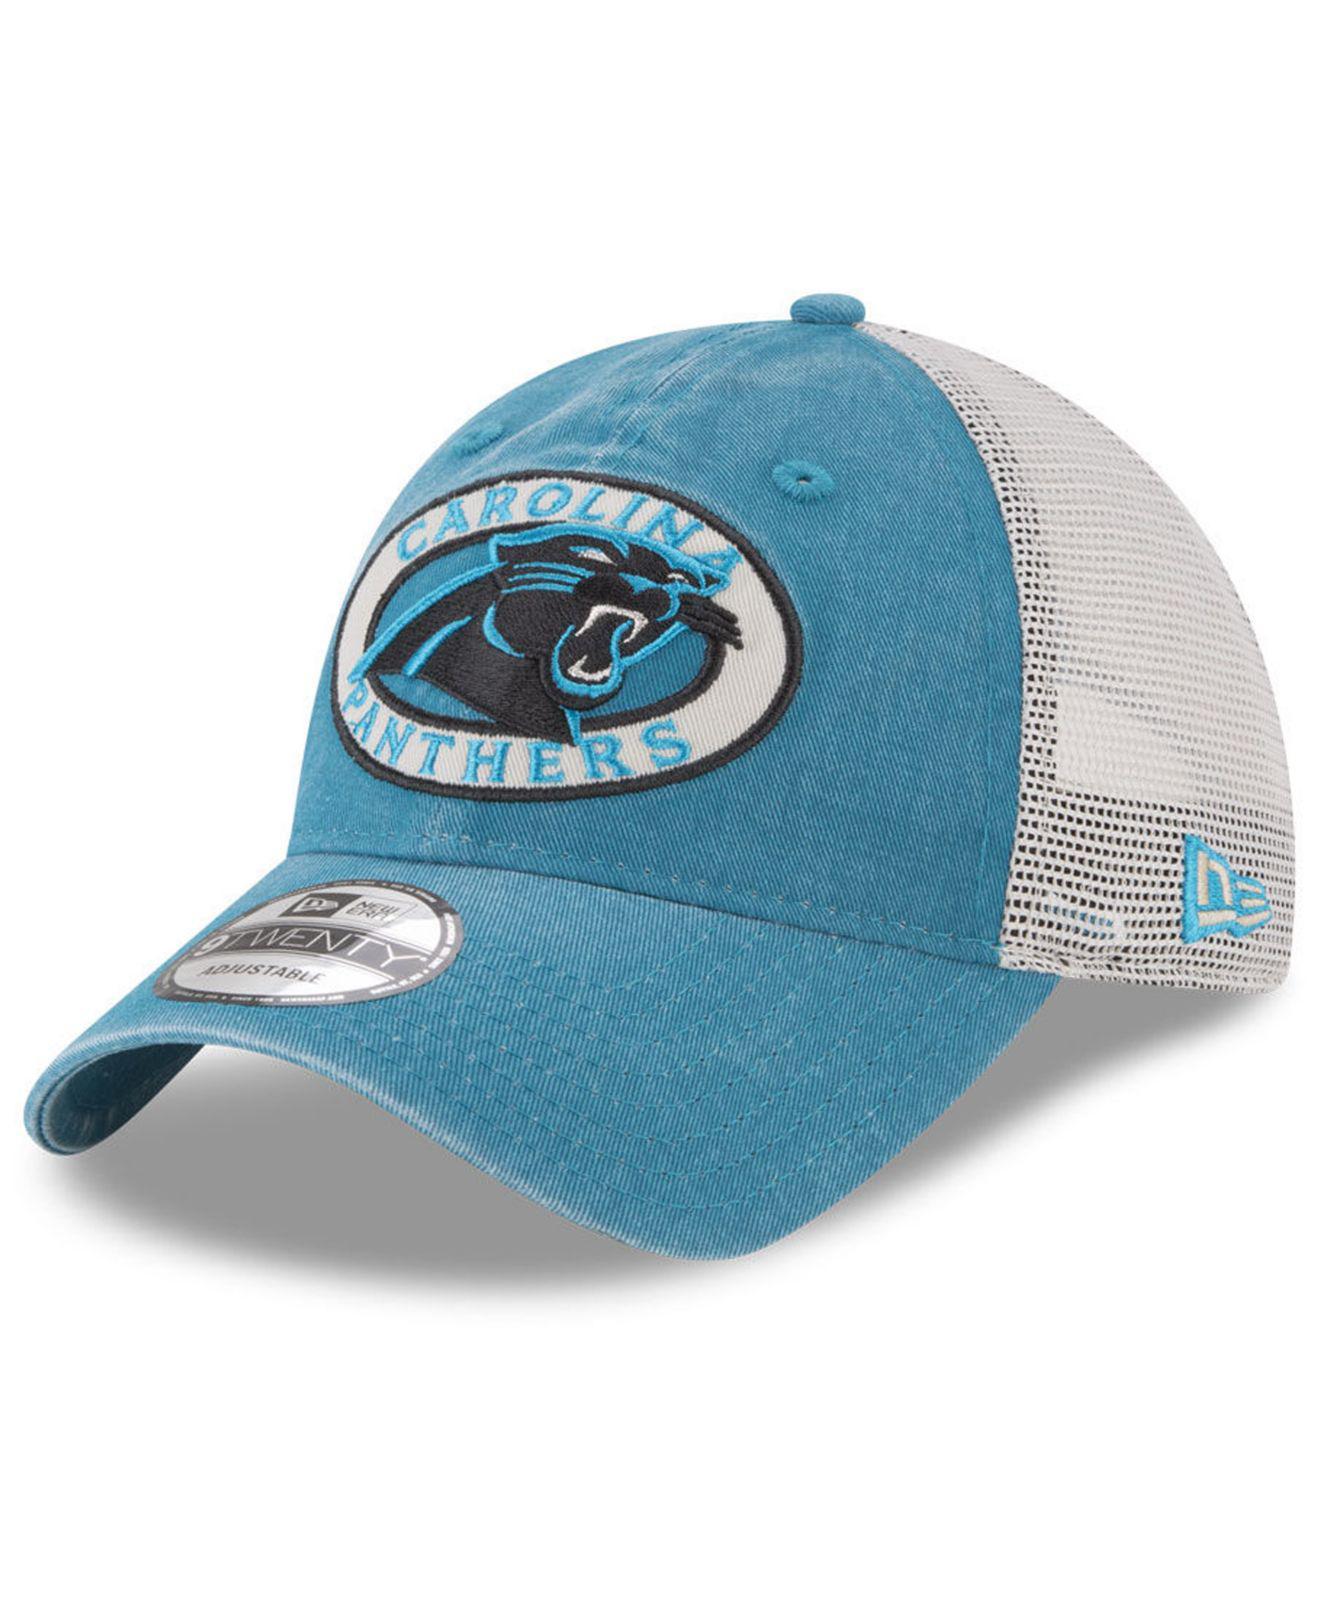 Lyst - Ktz Carolina Panthers Patched Pride 9twenty Cap in Blue for Men 808324e97